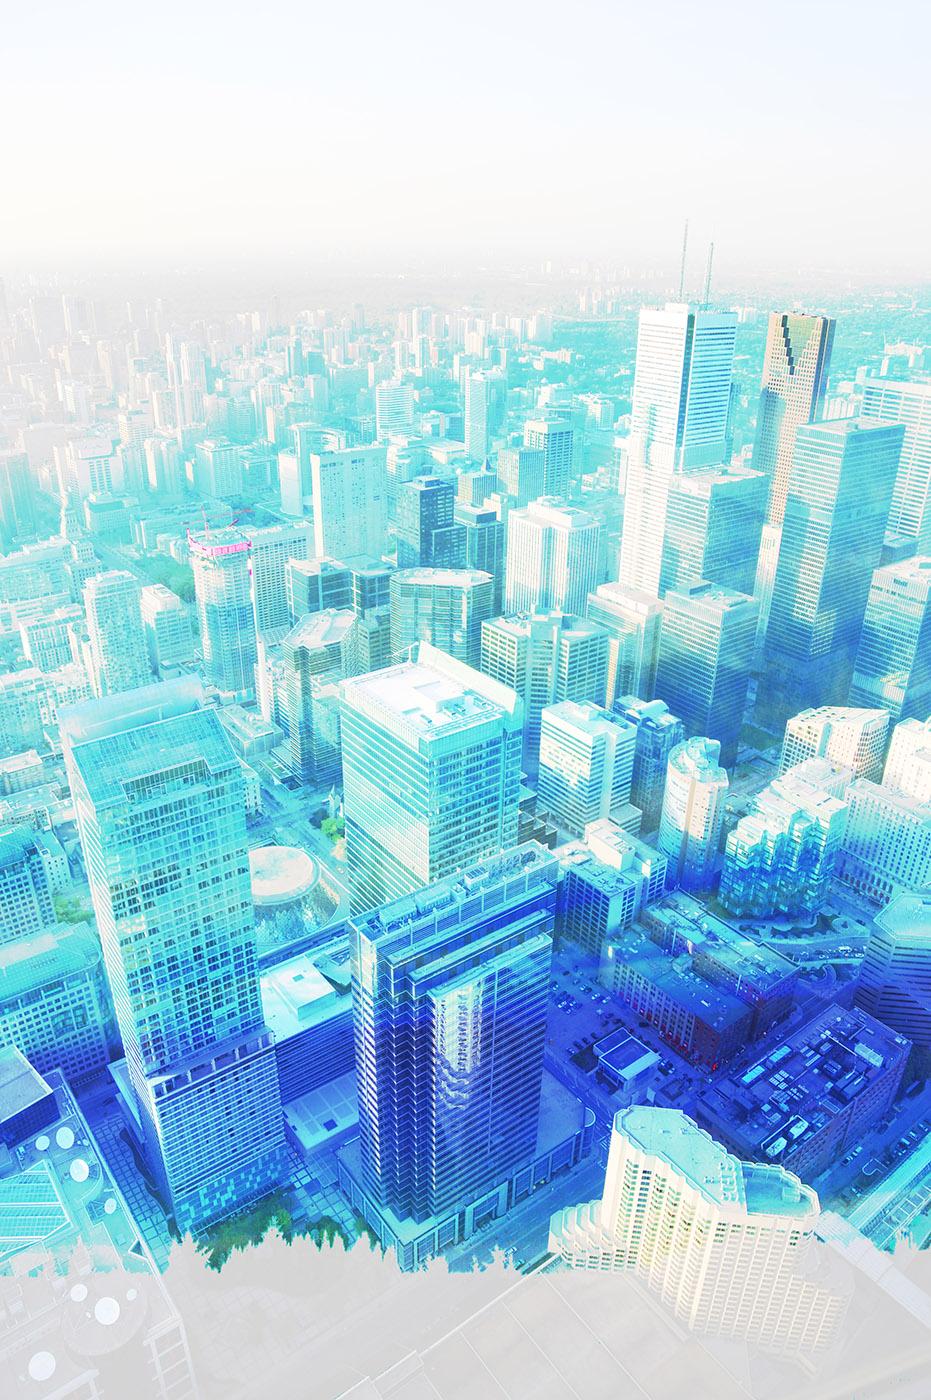 Urban Vertical Cityscape - RF Stock Image